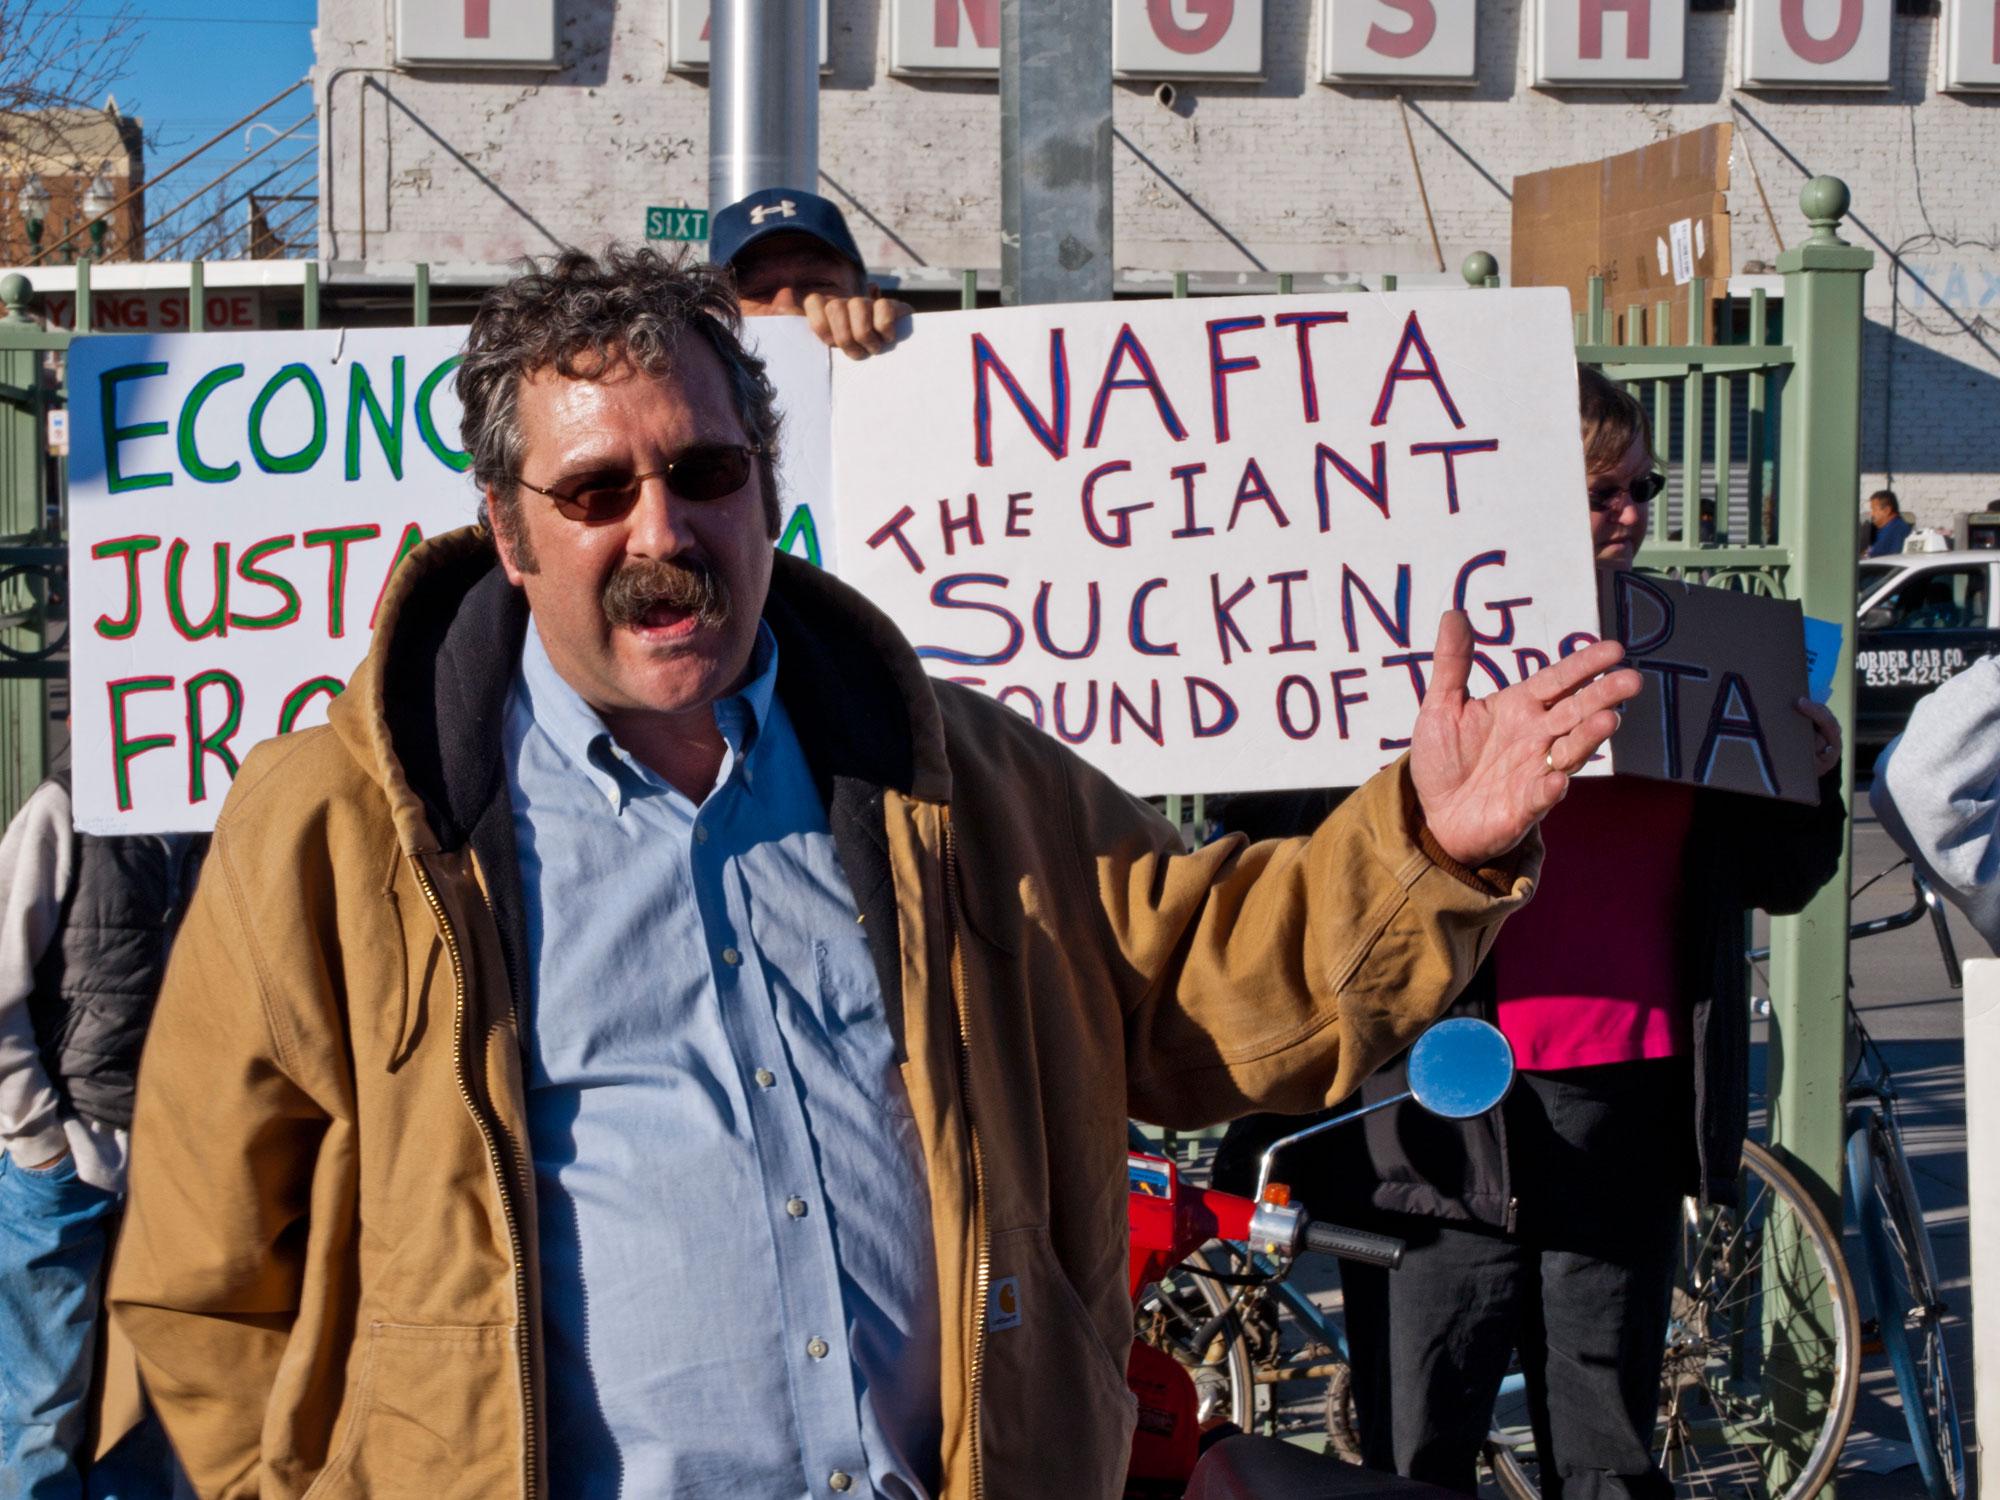 Dr. Joe Heyman, a volunteer with Occupy El Paso and a Professor at UTEP, speaks at Santa Fe bridge. (Robert Brown/Borderzine.com)